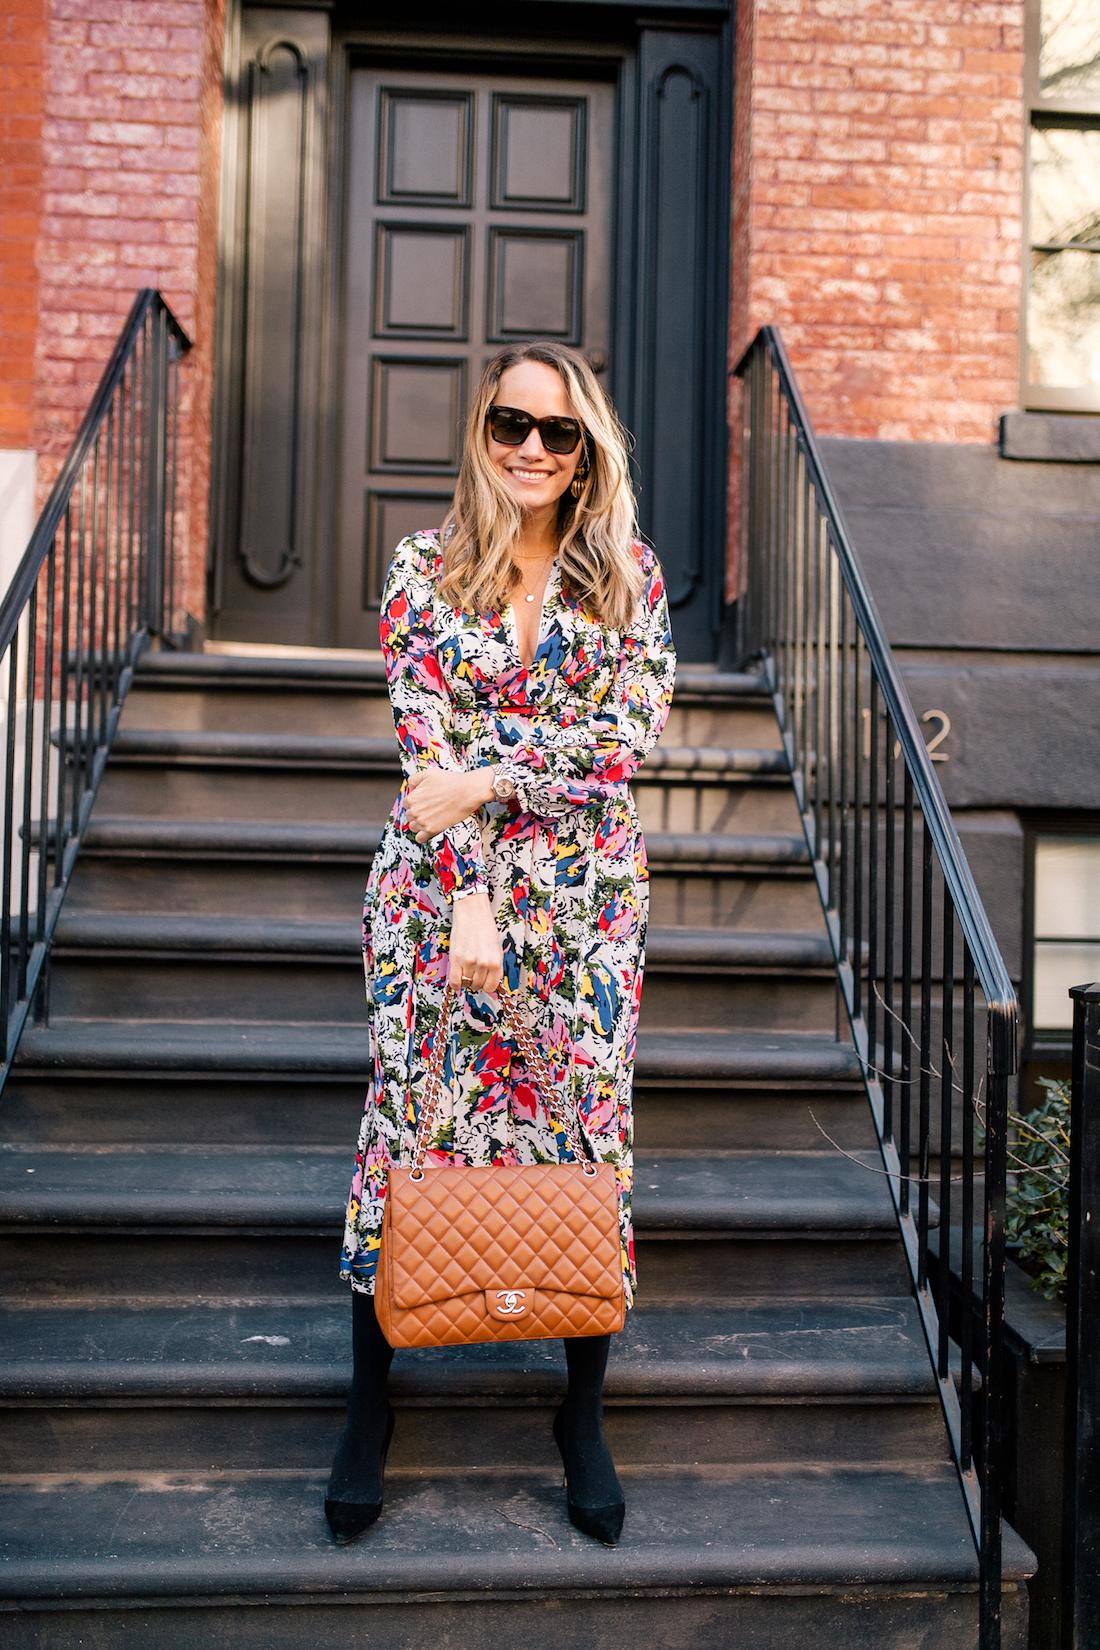 Grace Atwwod's Outfit Details: Rixo Floral Dress // Express Tights // Manolo Blahnik Heels // Chanel Purse // Celine Sunglasses // Tuckernuck Birdcage Earrings